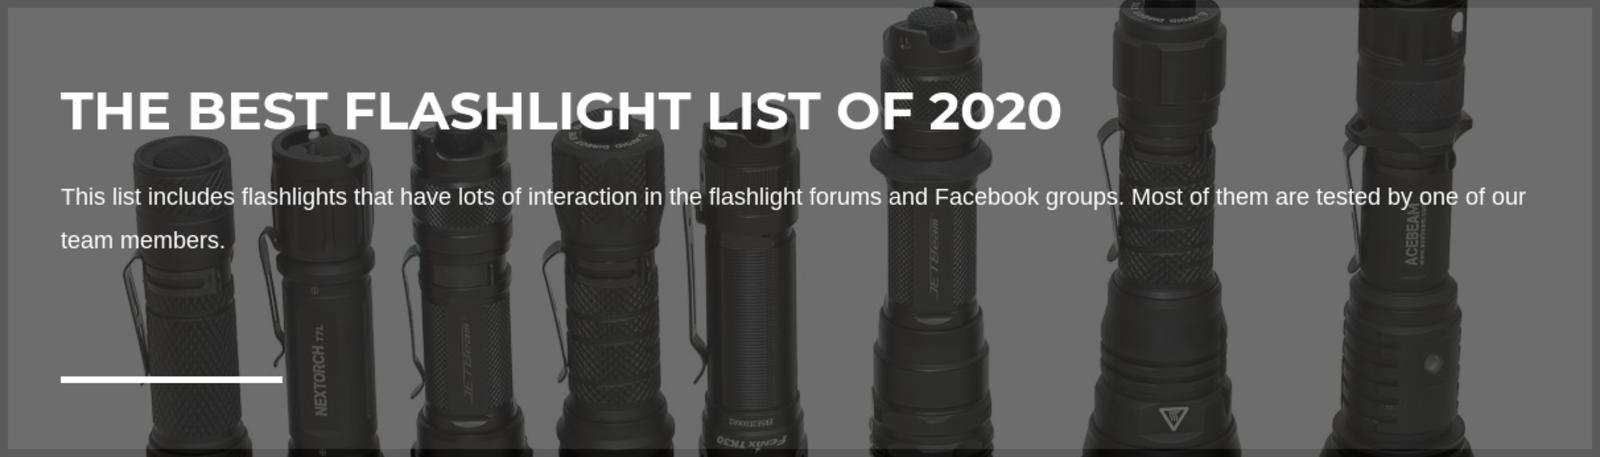 Best Flashlights List 2020